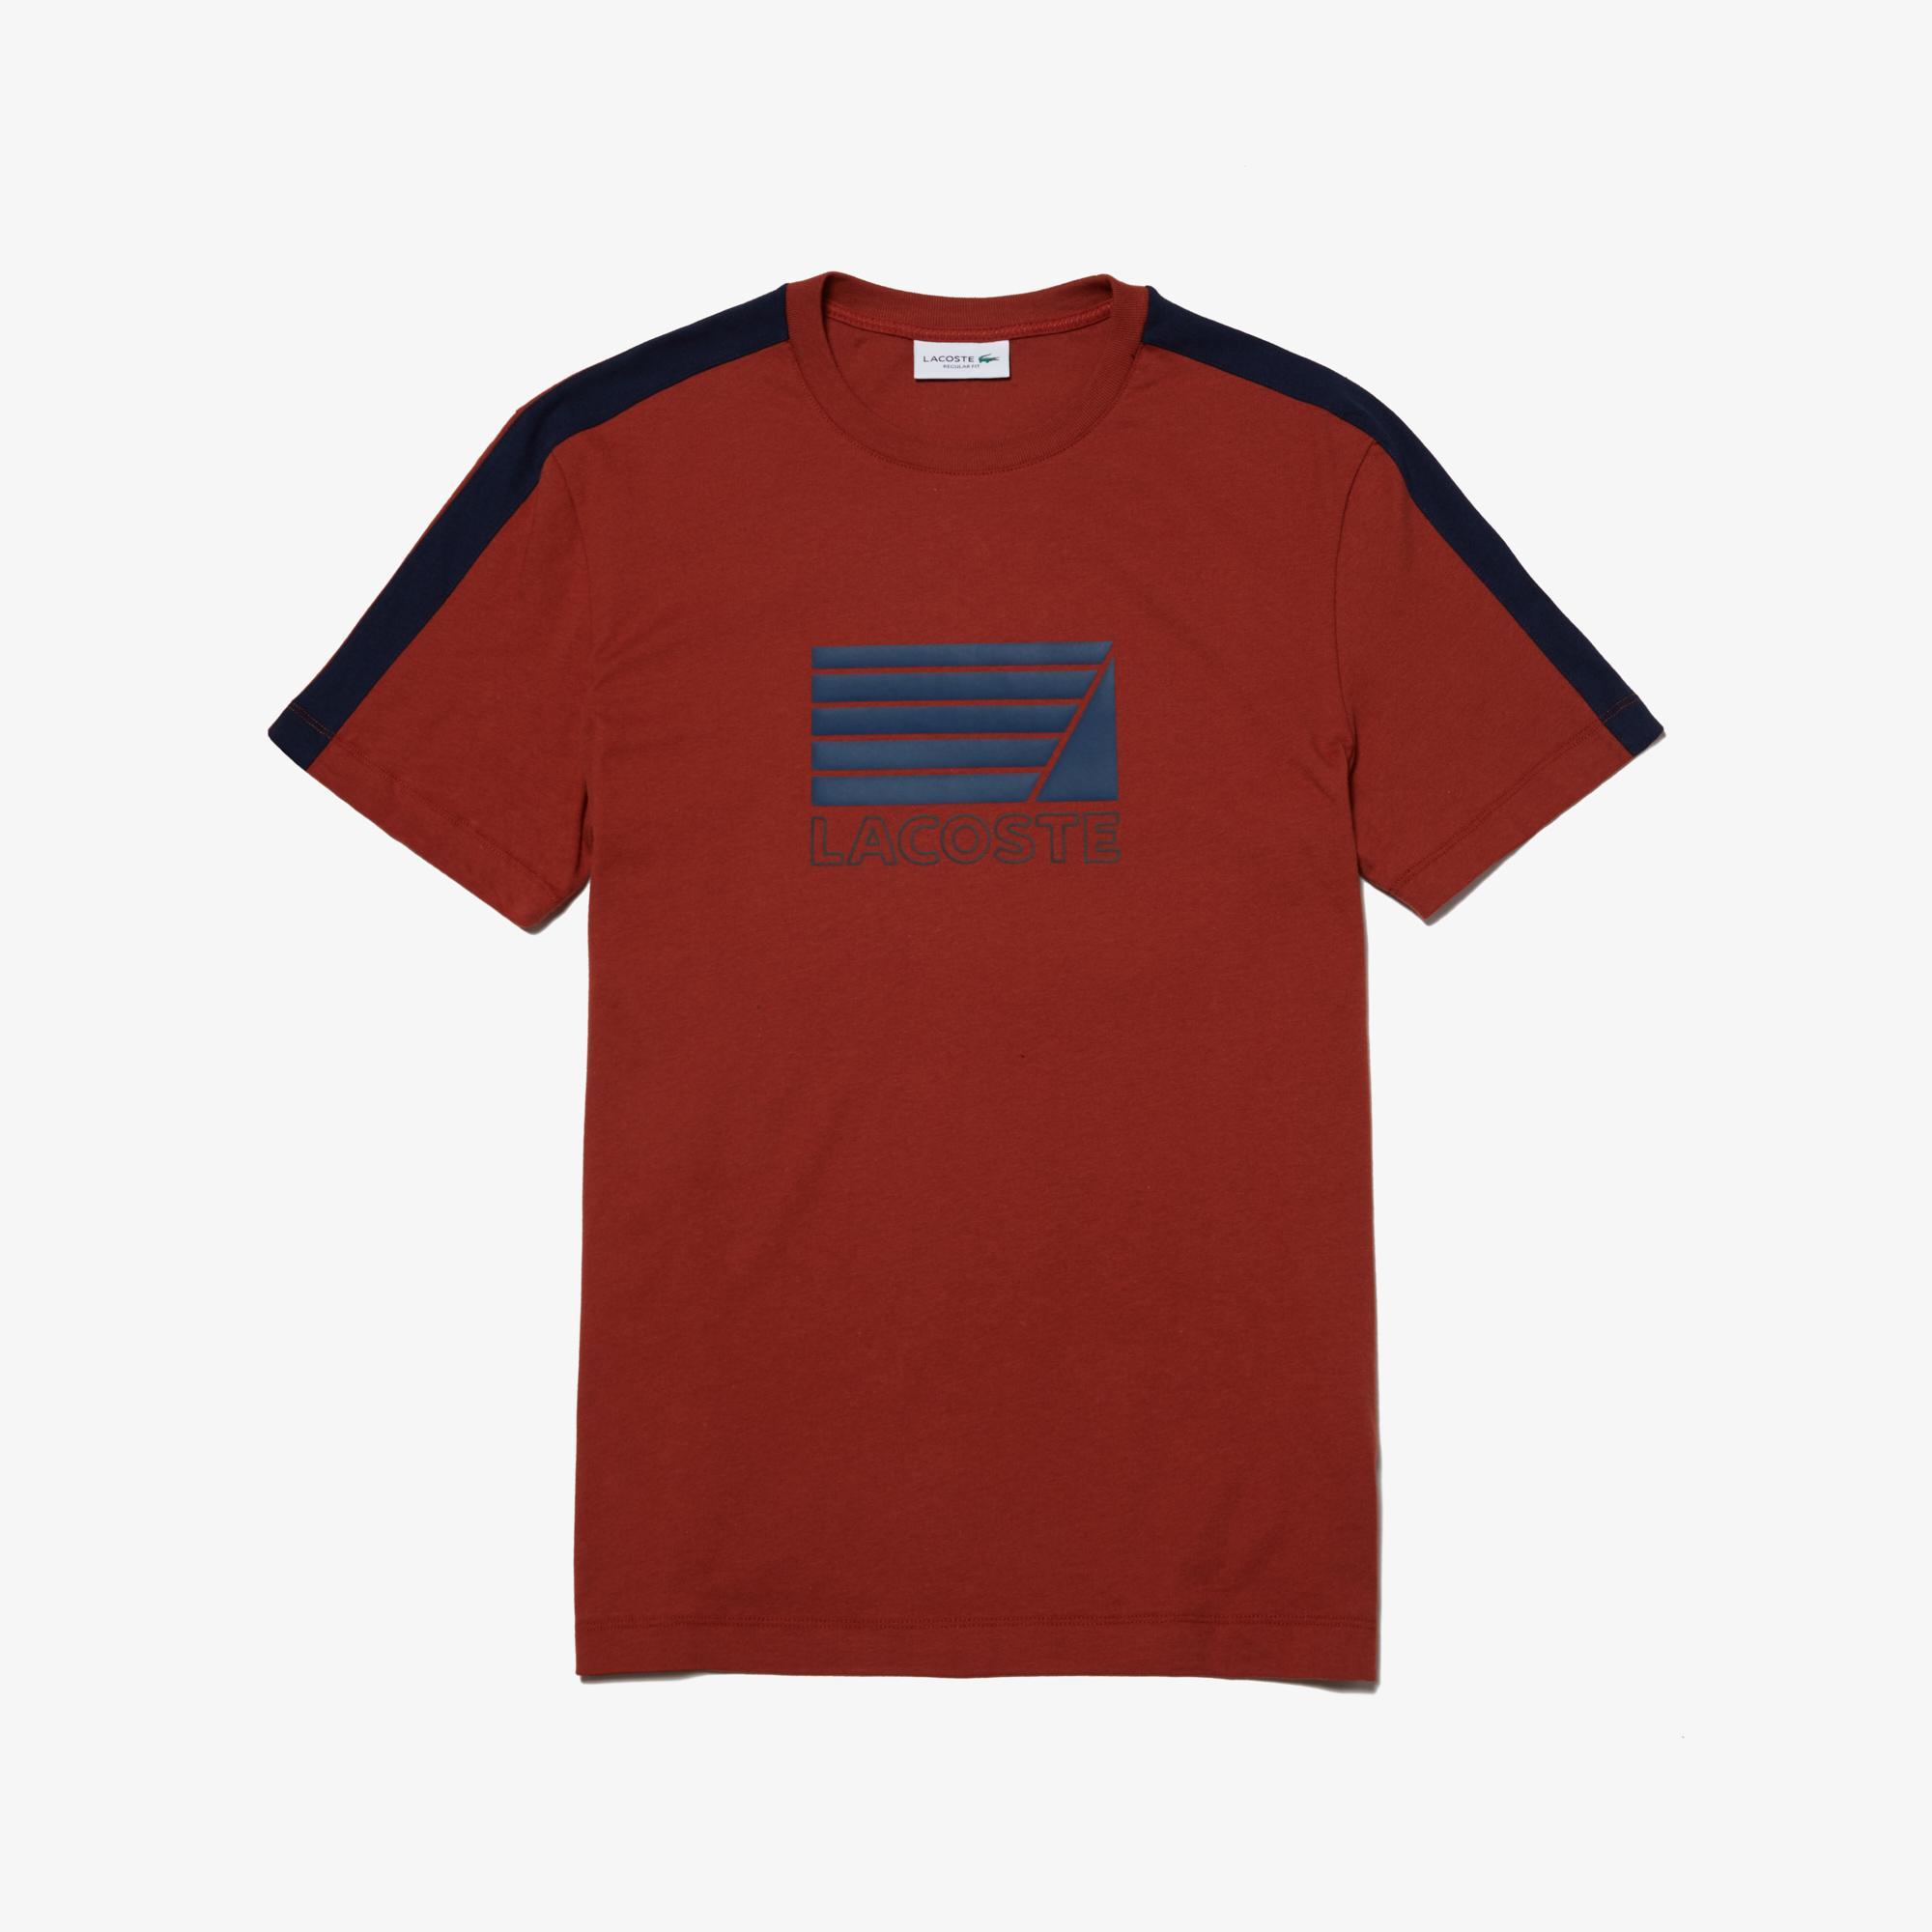 Lacoste Erkek Regular Fit Lacoste Baskılı Bordo T-Shirt